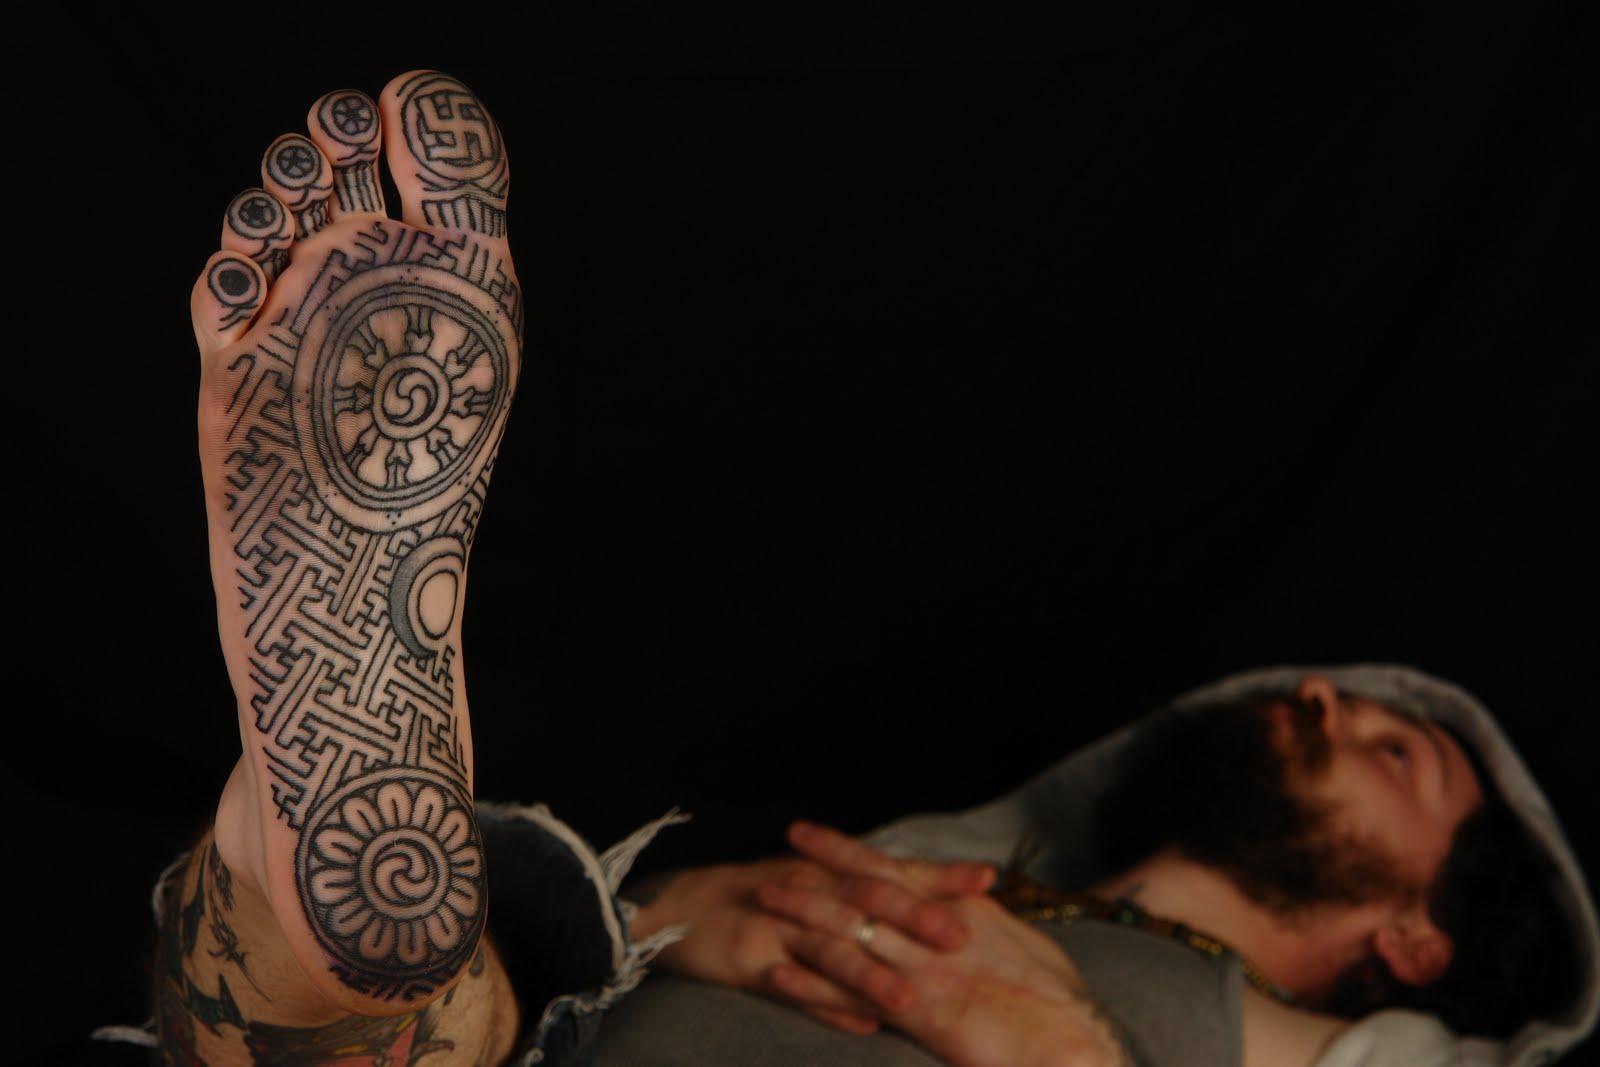 22 buddhist tattoo designs images and ideas black buddhist symbol tattoo on man right lower foot biocorpaavc Images